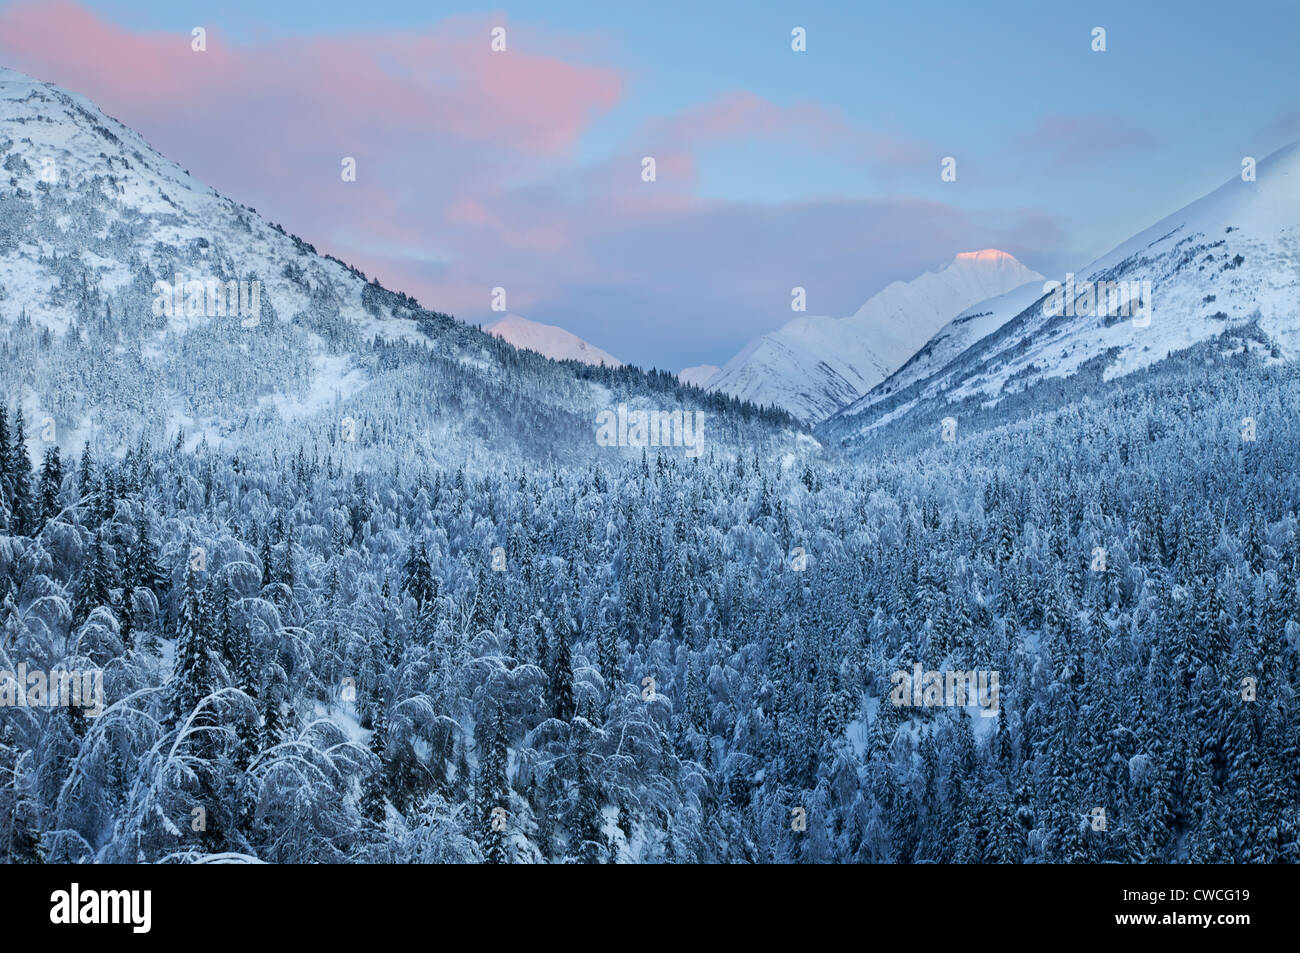 Árboles nevados al atardecer, el Bosque Nacional de Chugach, Alaska. Imagen De Stock